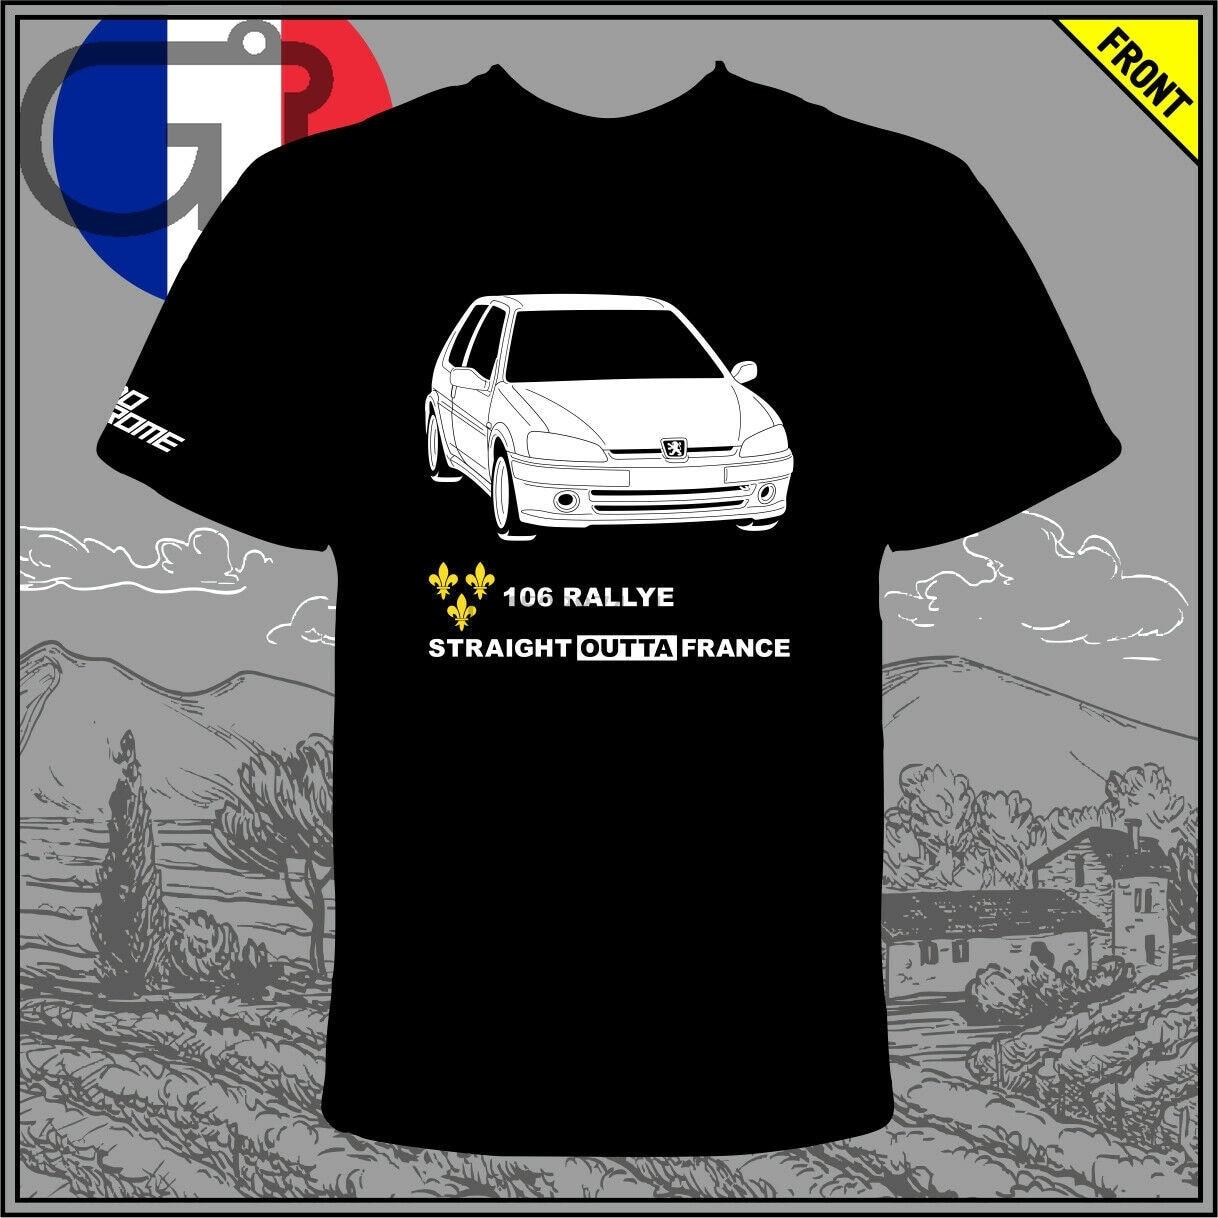 GT-camisa Peugeot 106 Rallye S2 97-98 Camiseta tee